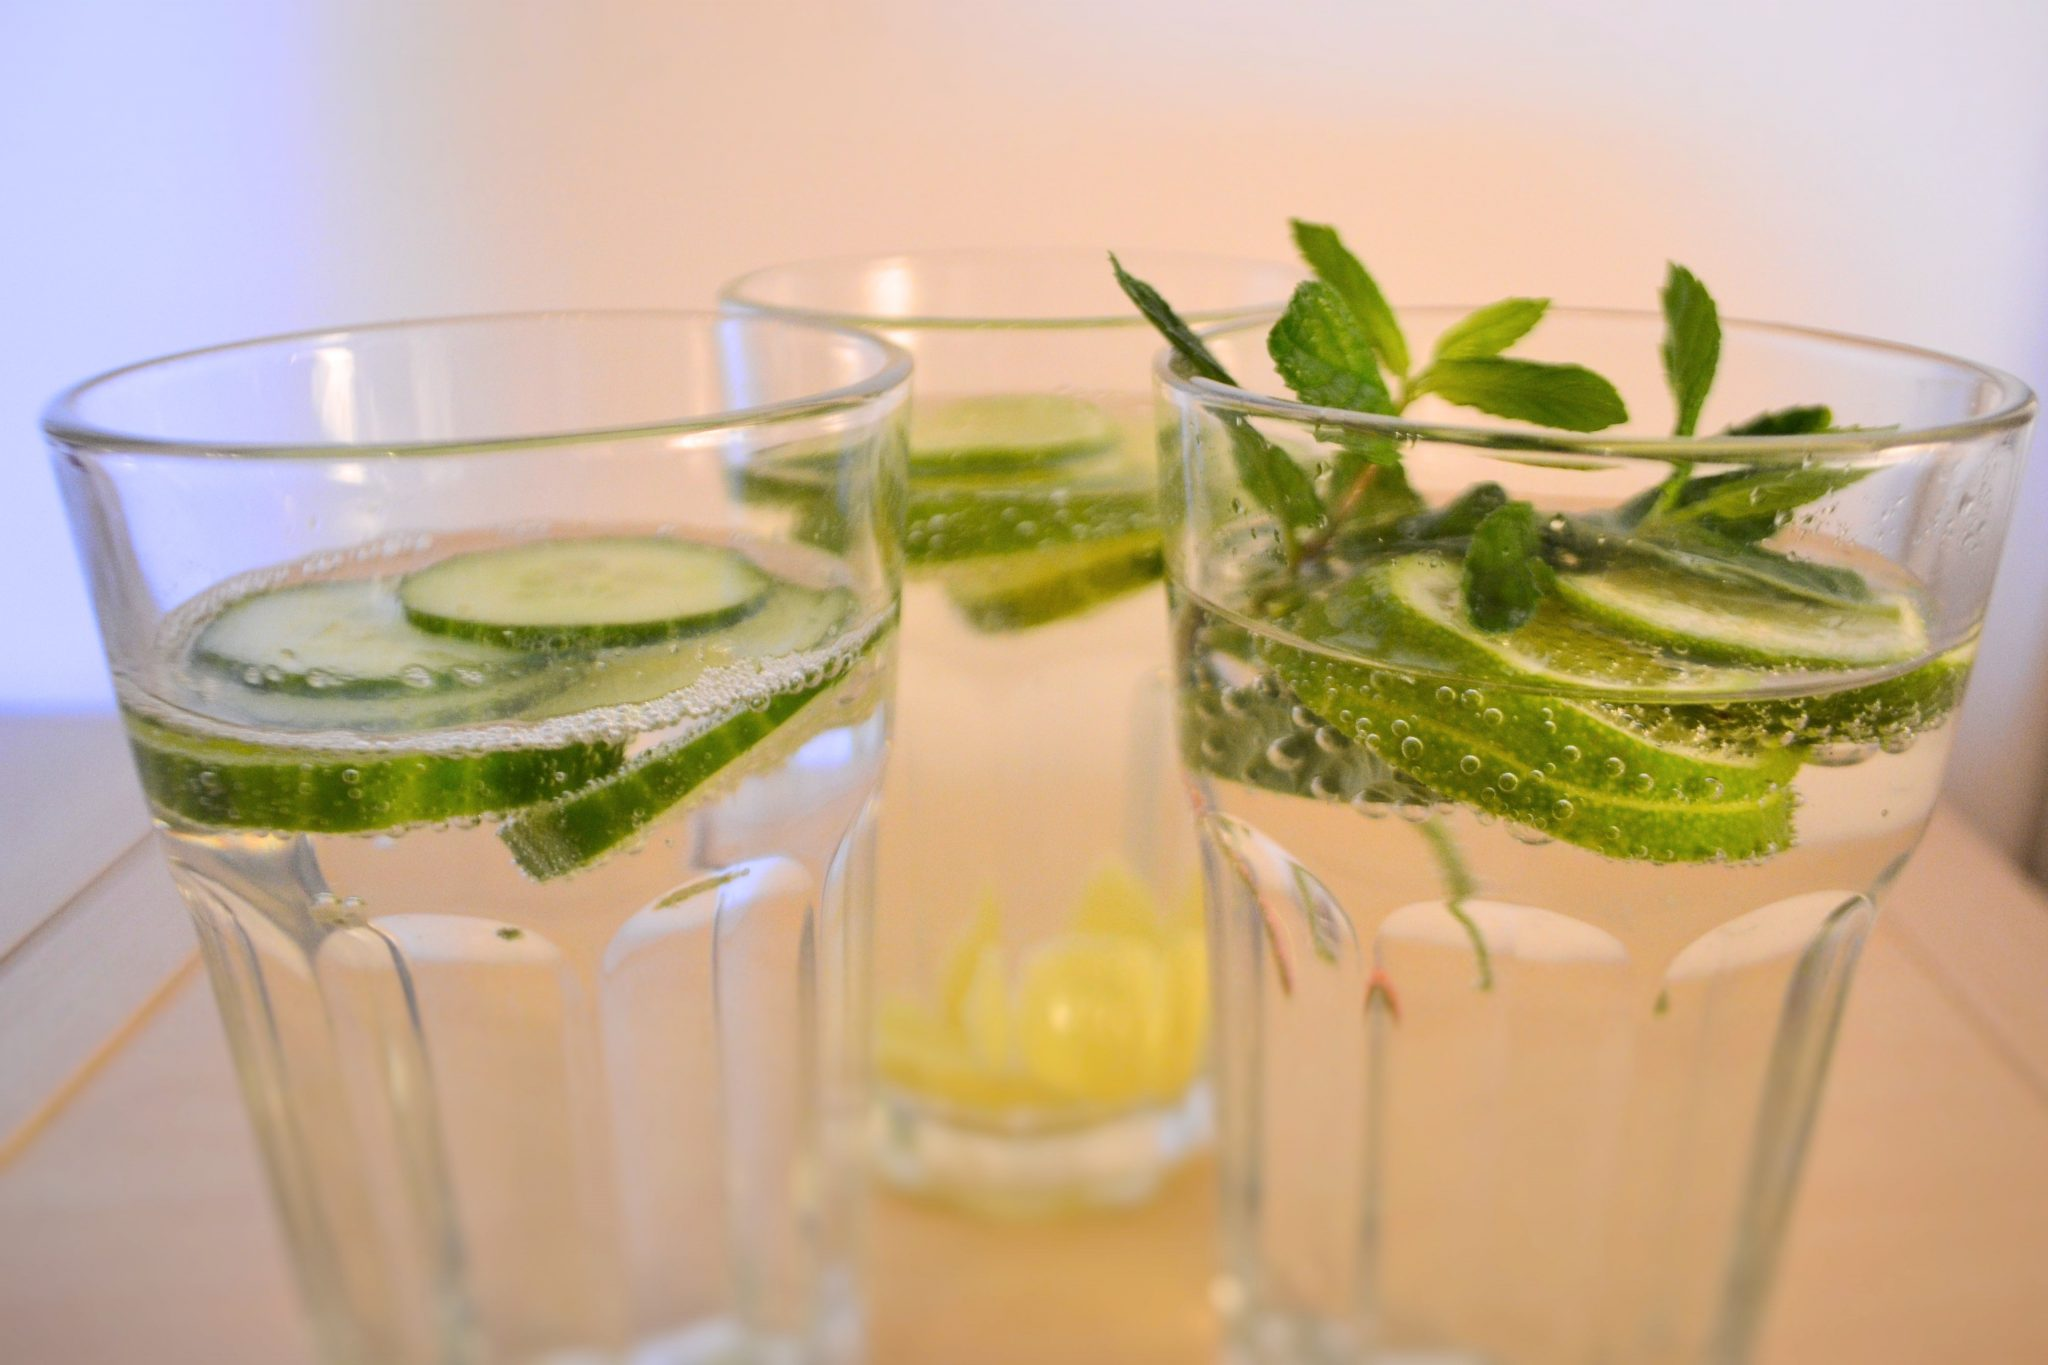 Fruchtig lecker - Gesunde Getränke selbstgemacht - Fitnessblog.de